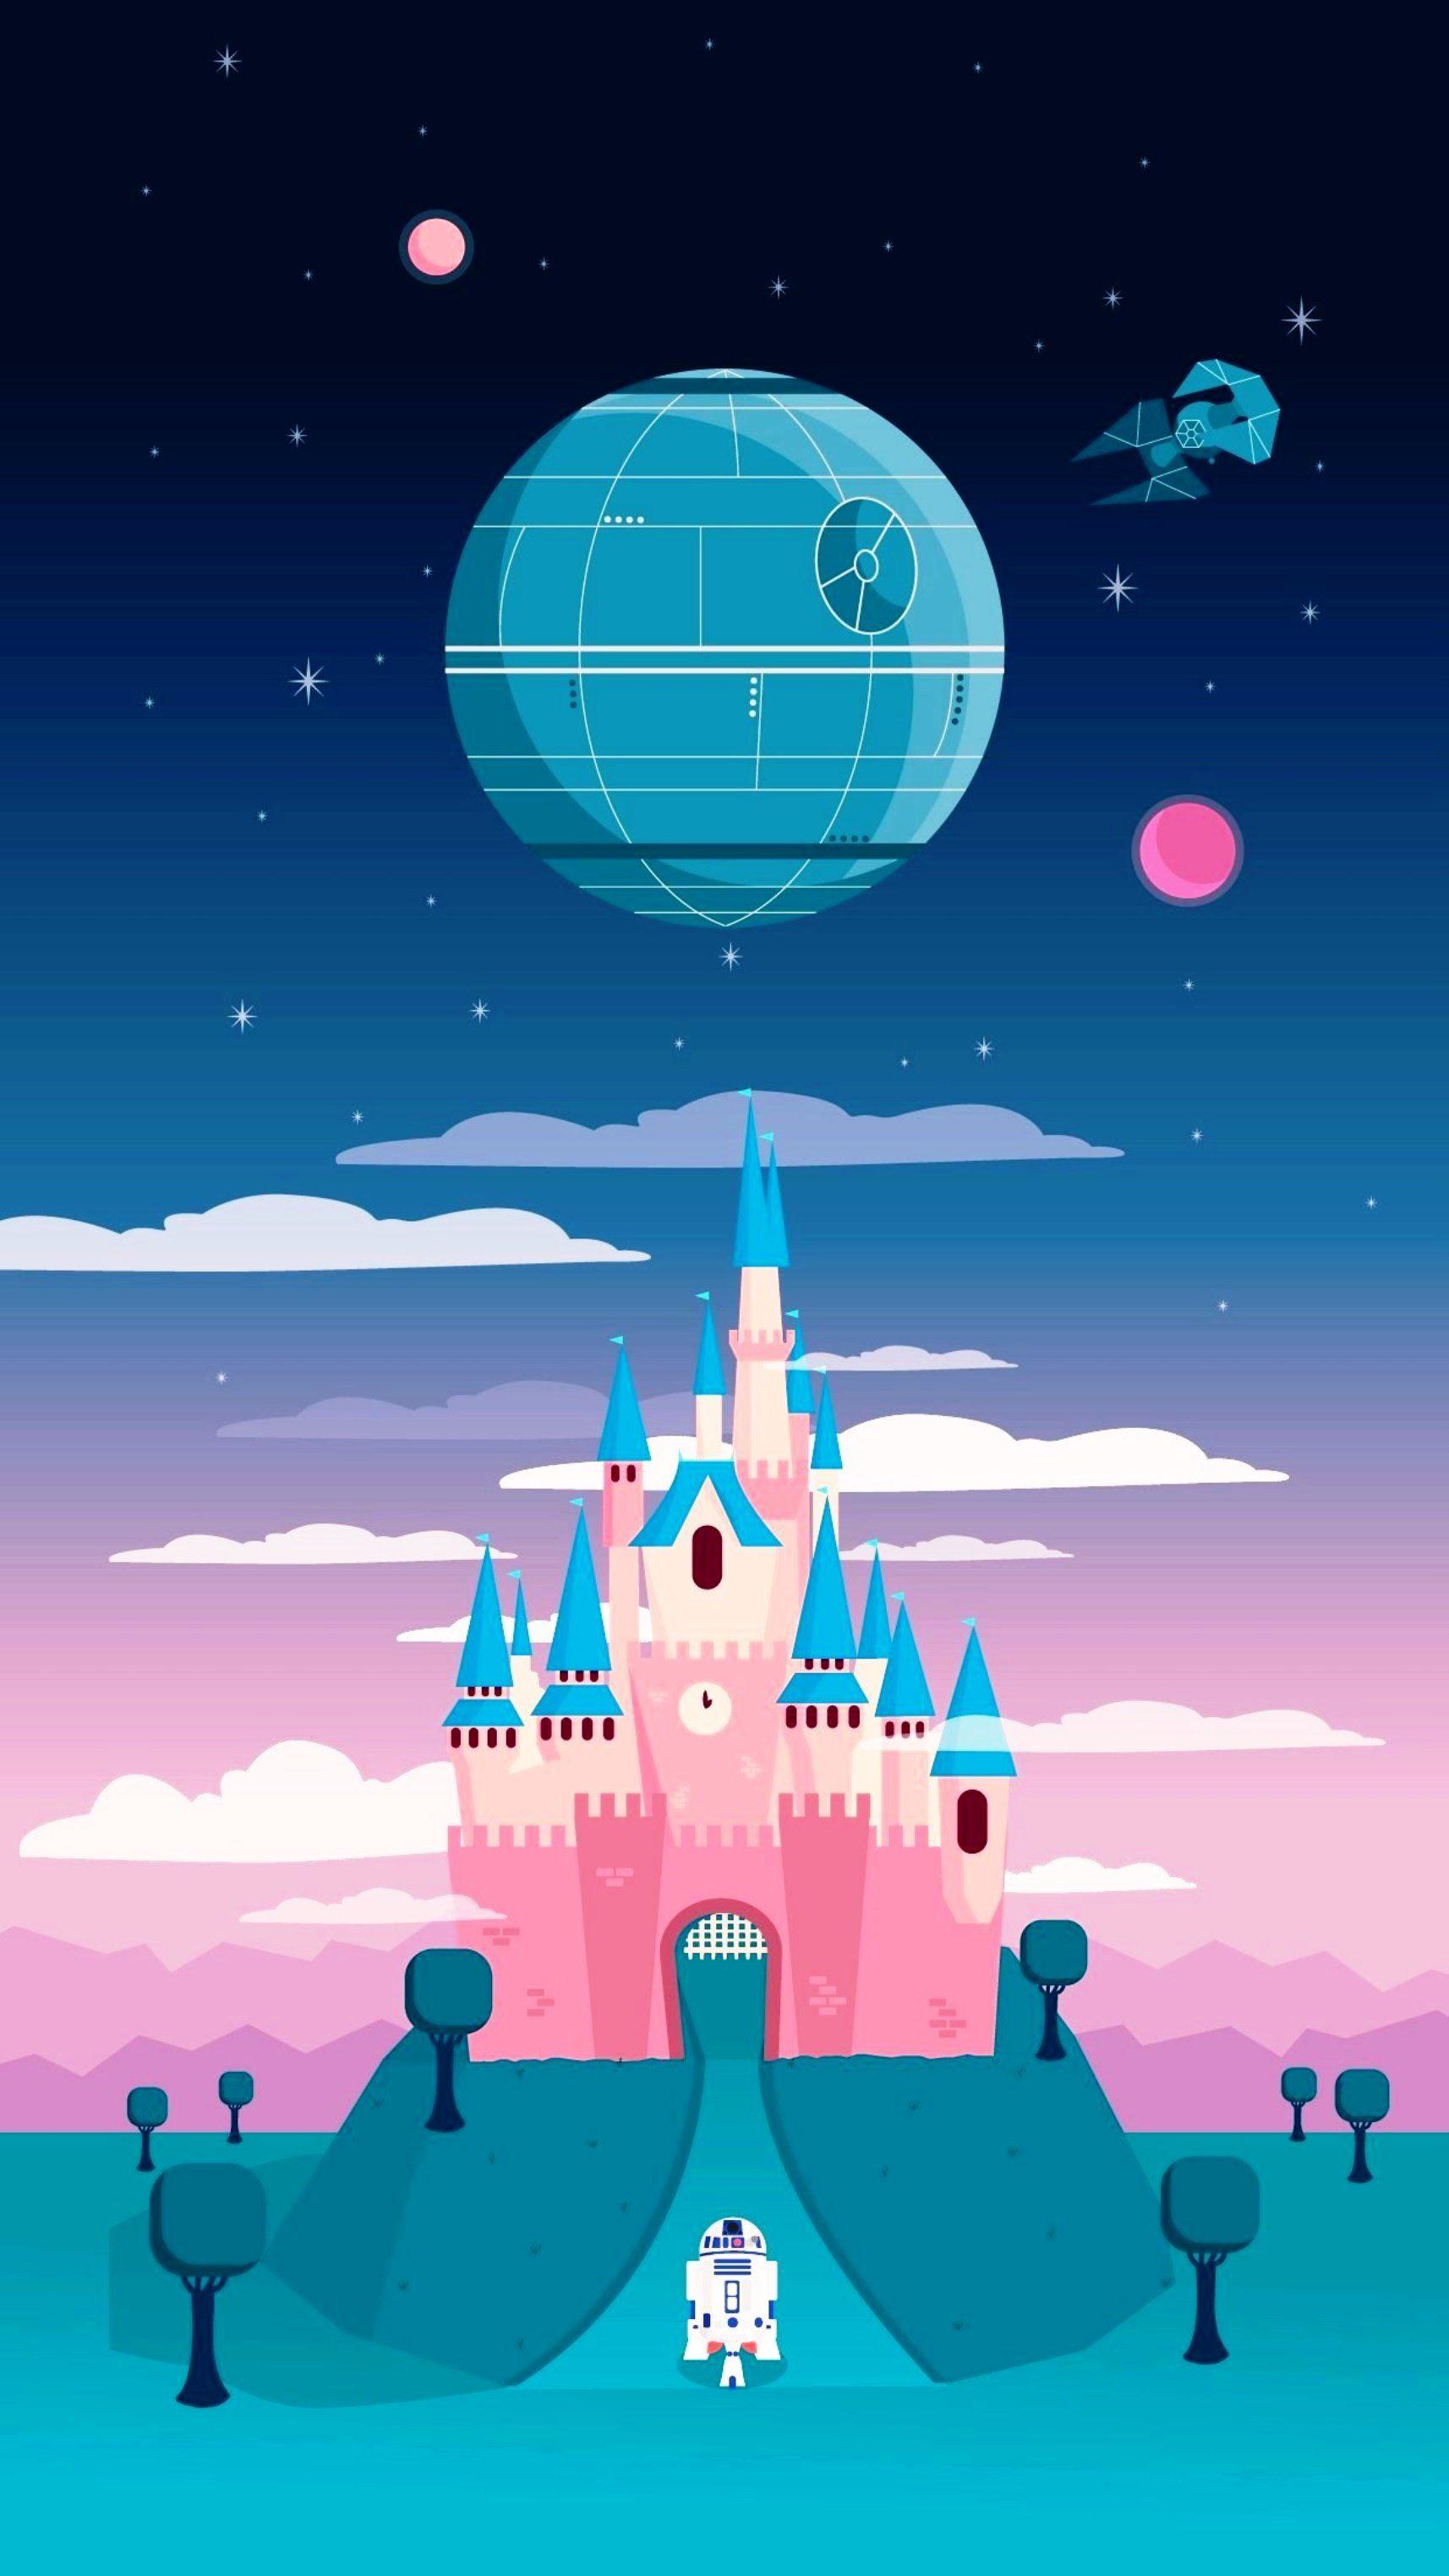 Best ideas about disney wallpaper on pinterest disney hd - Disney world wallpaper iphone ...